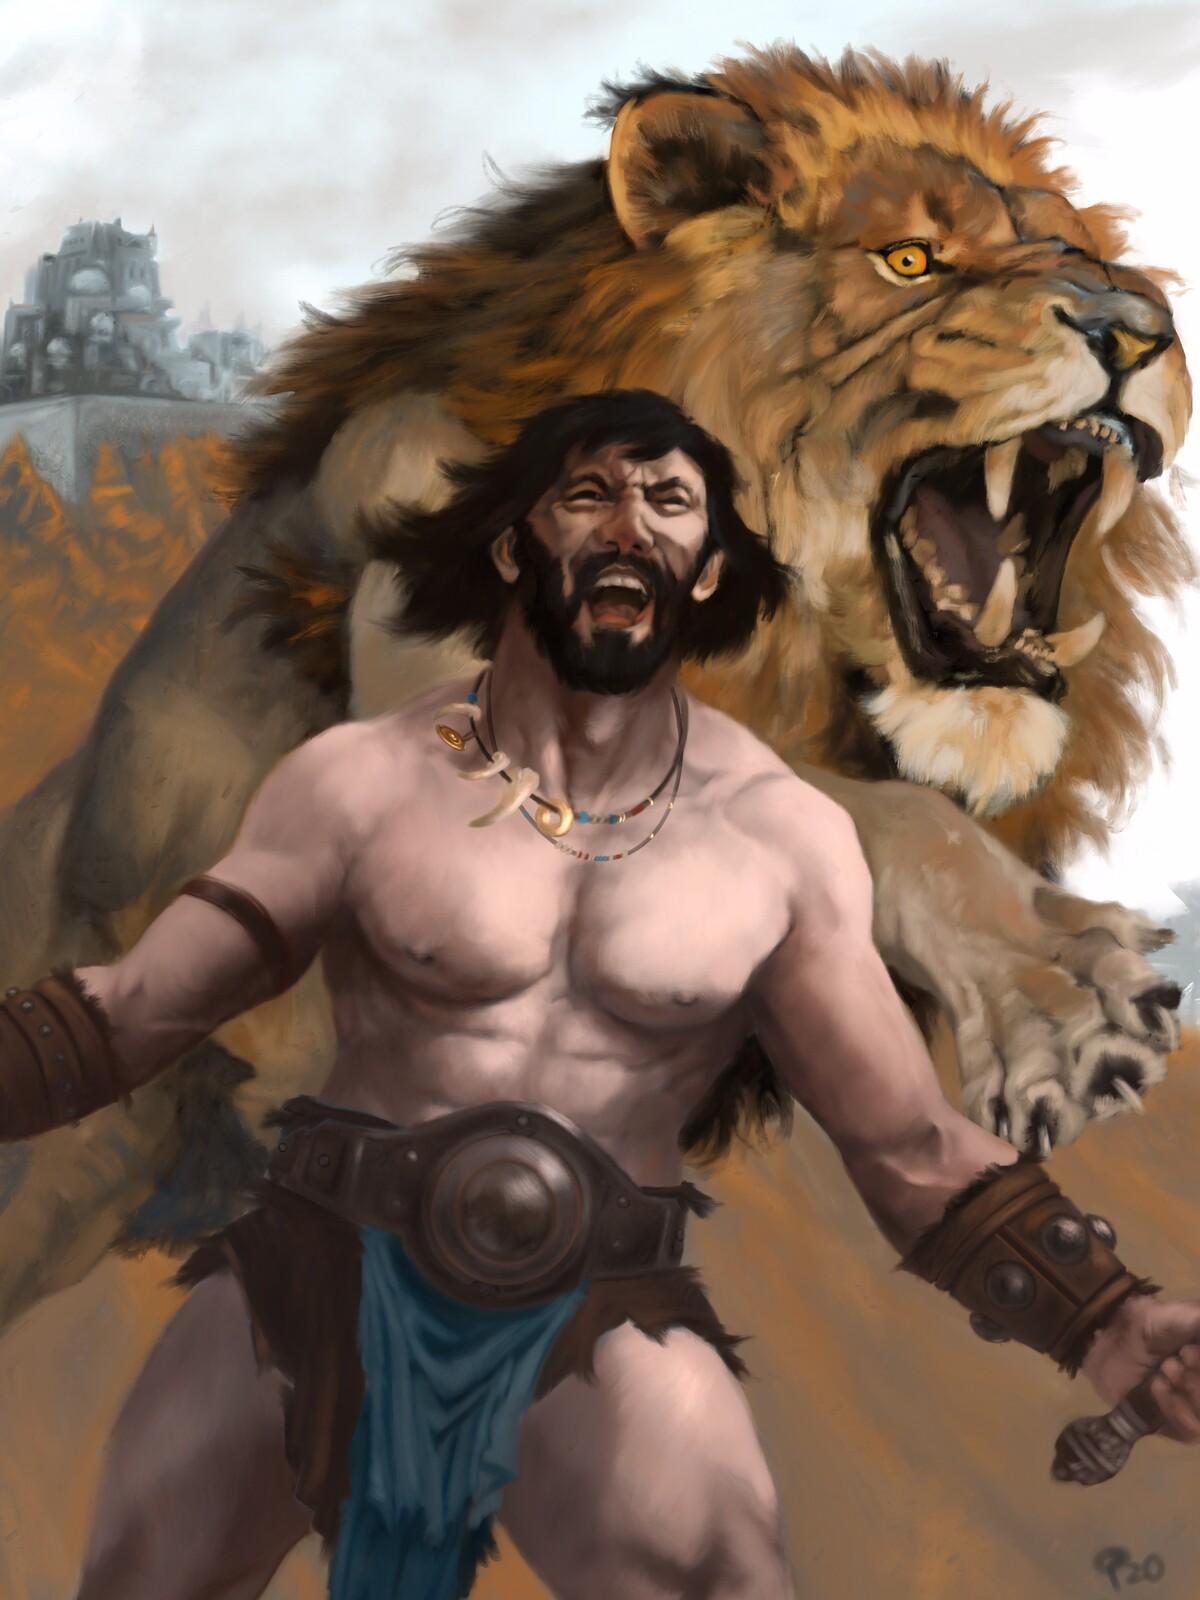 King of Aquilonia